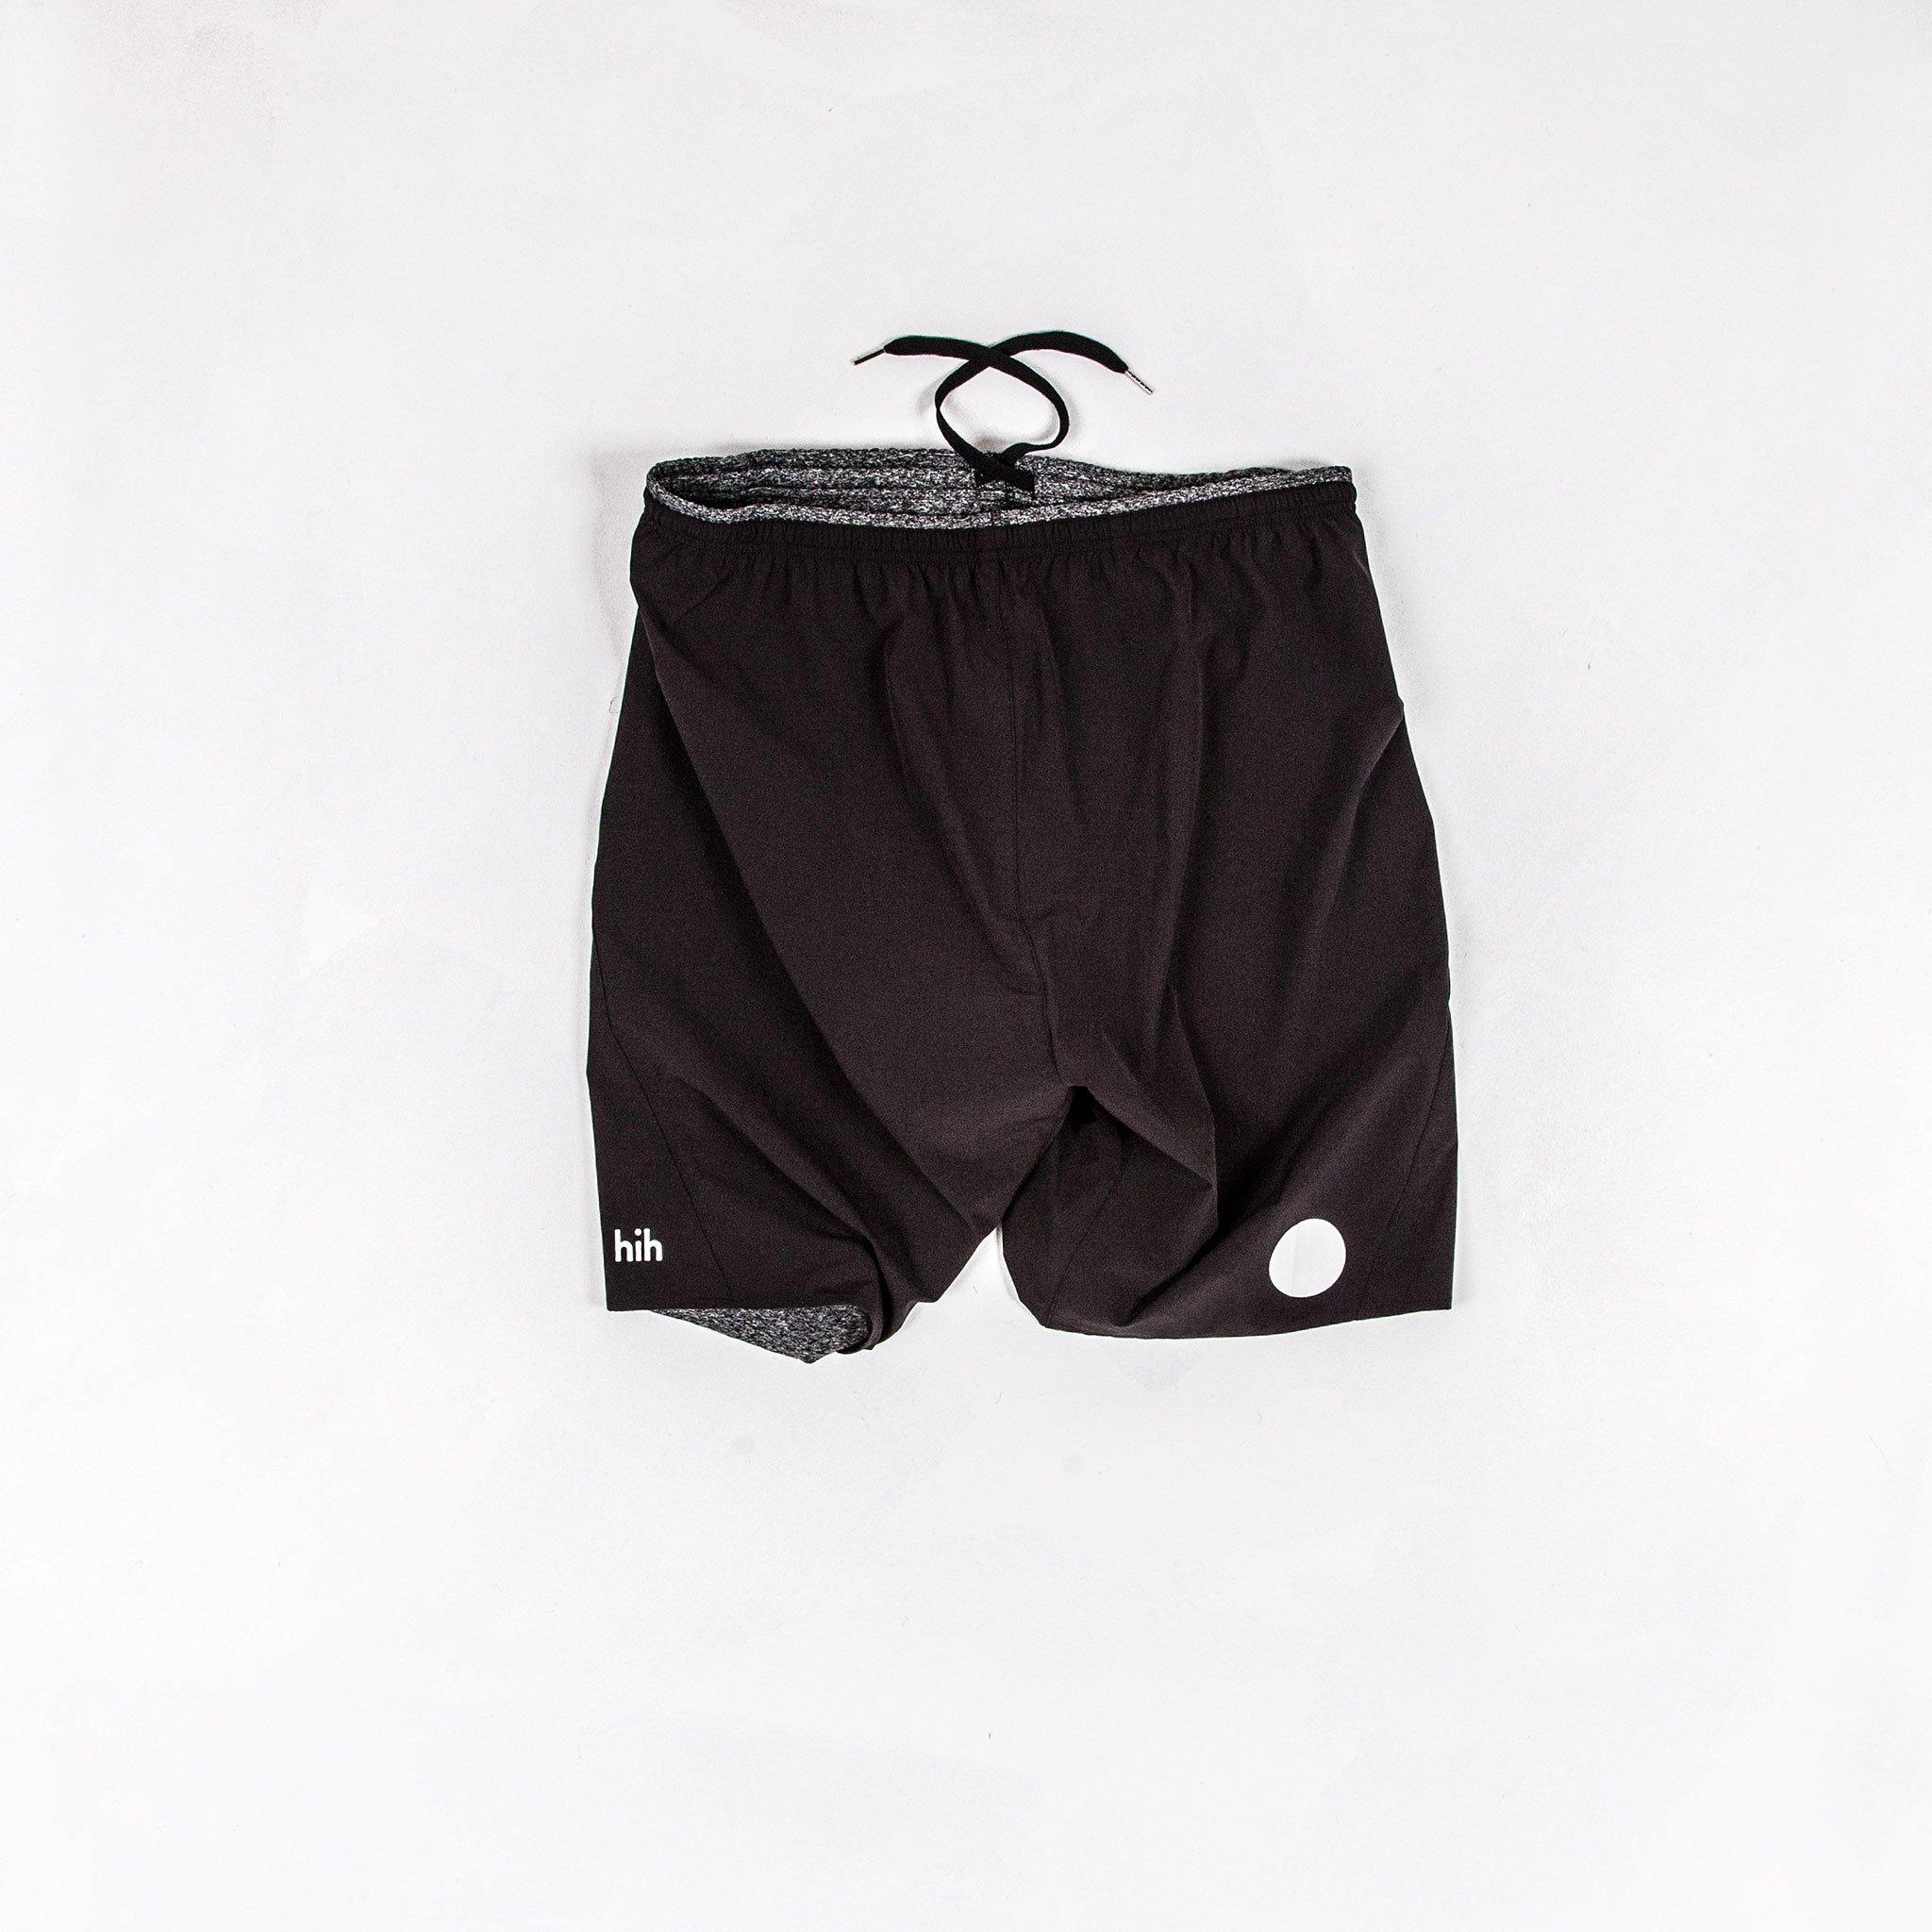 hih_clothing_run_run_short_new_zealand